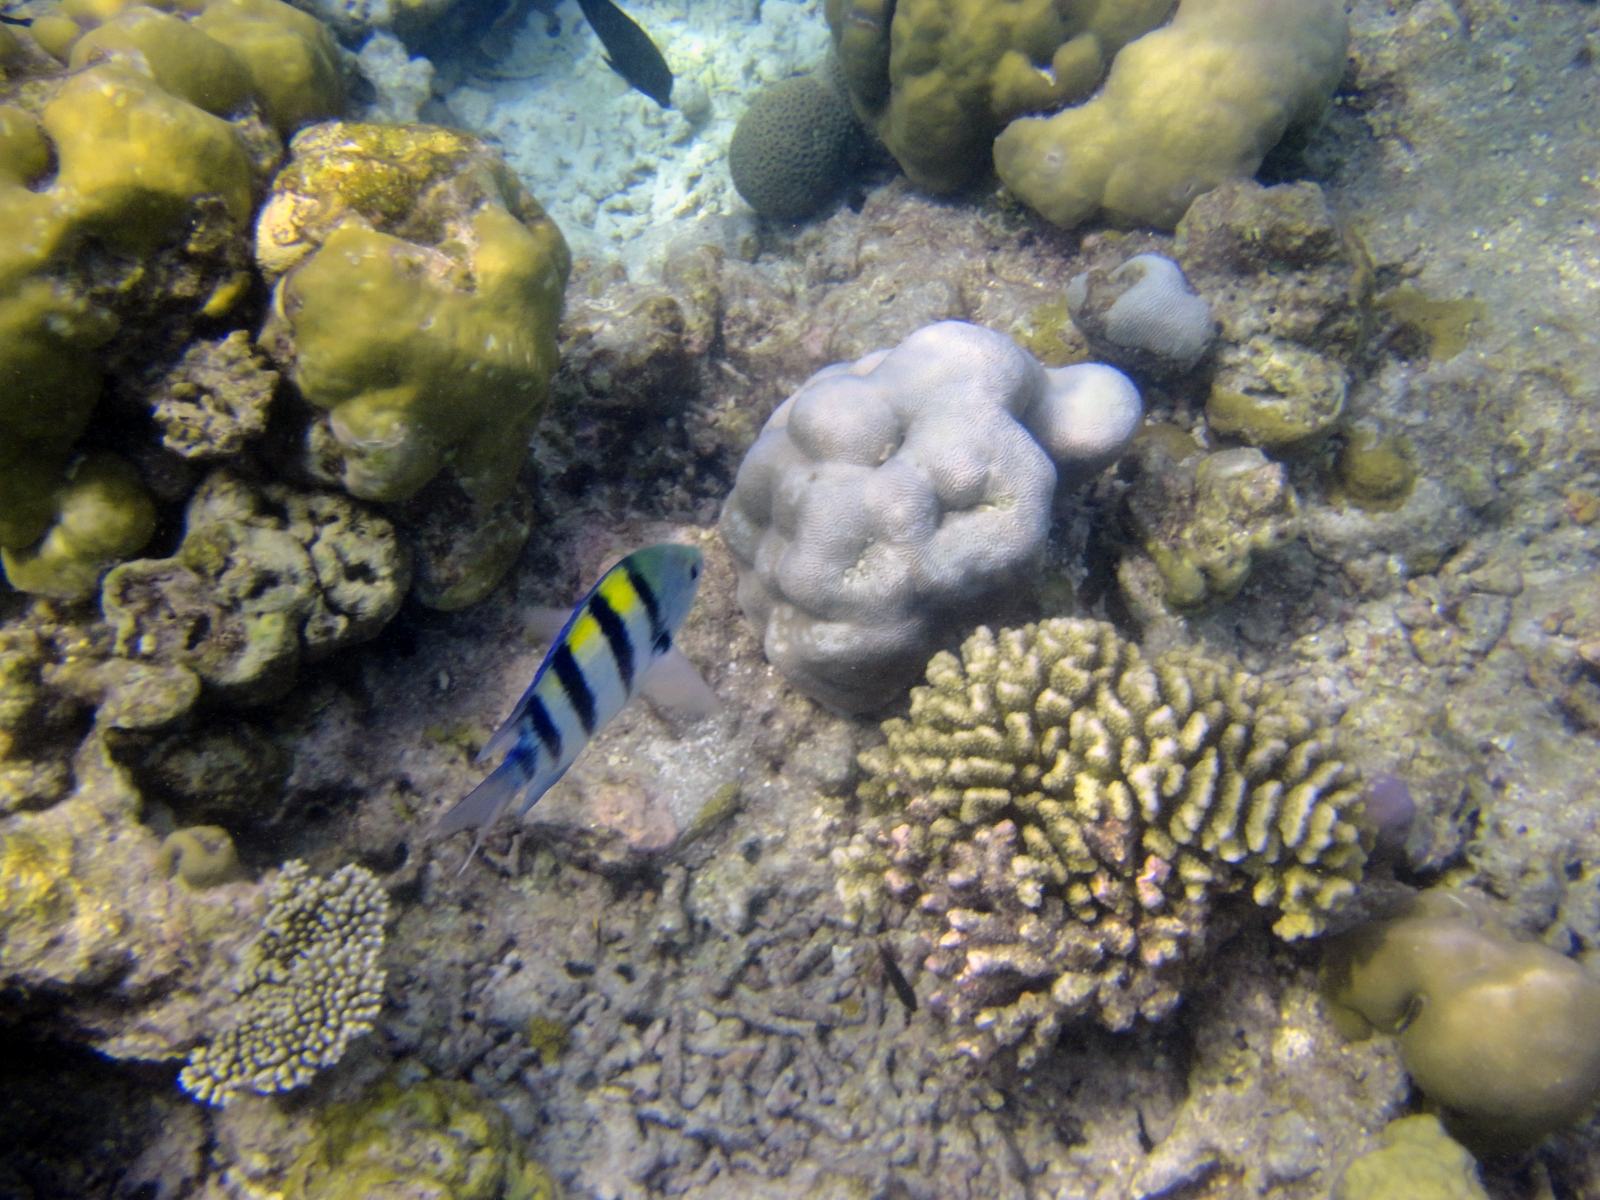 Abudefduf_vaigiensis_003_C_Damiselas-Peces-Payaso_L_Maldivas_U_Sebas_02072015